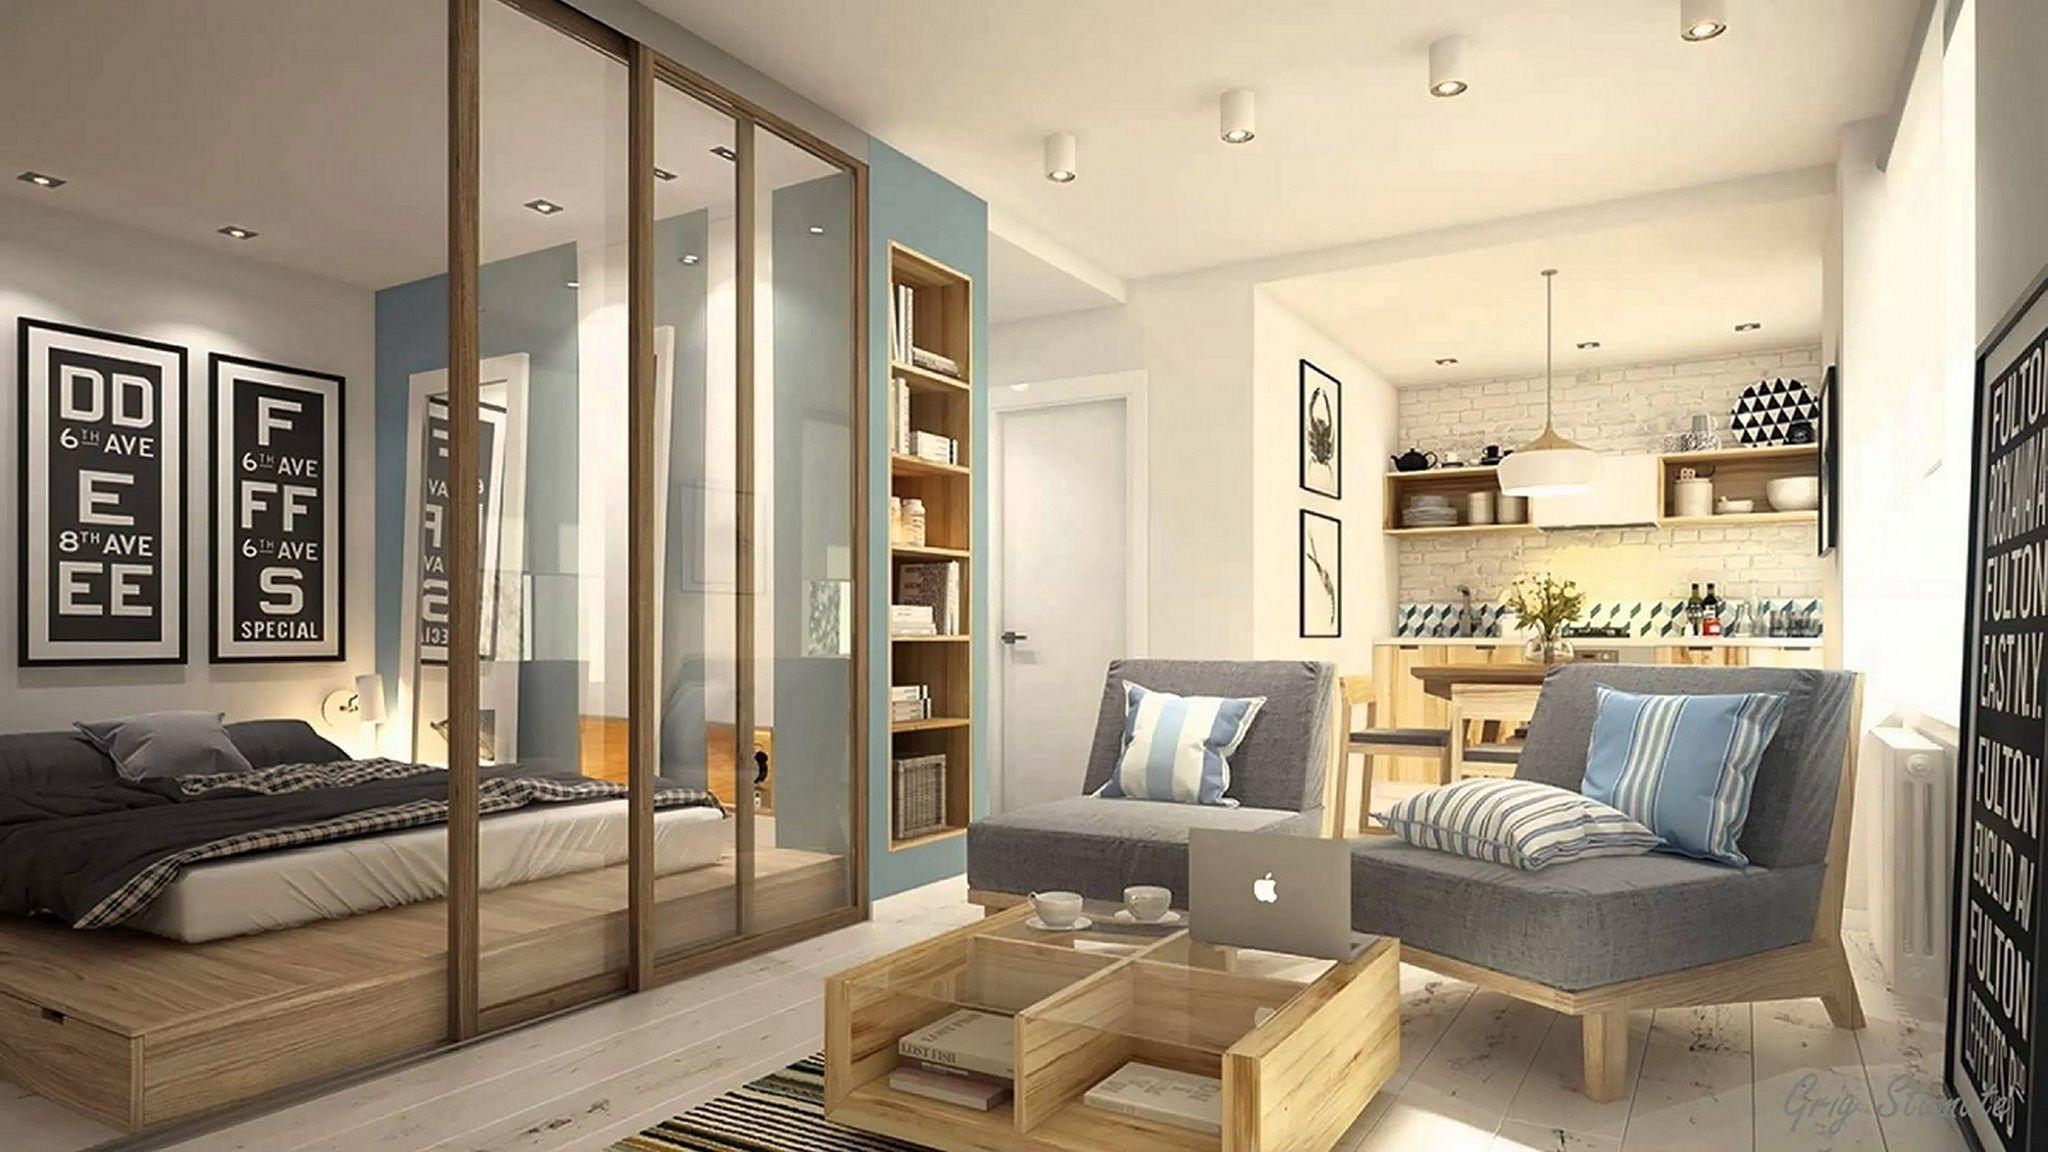 Awesome Small Studio Apartment Design